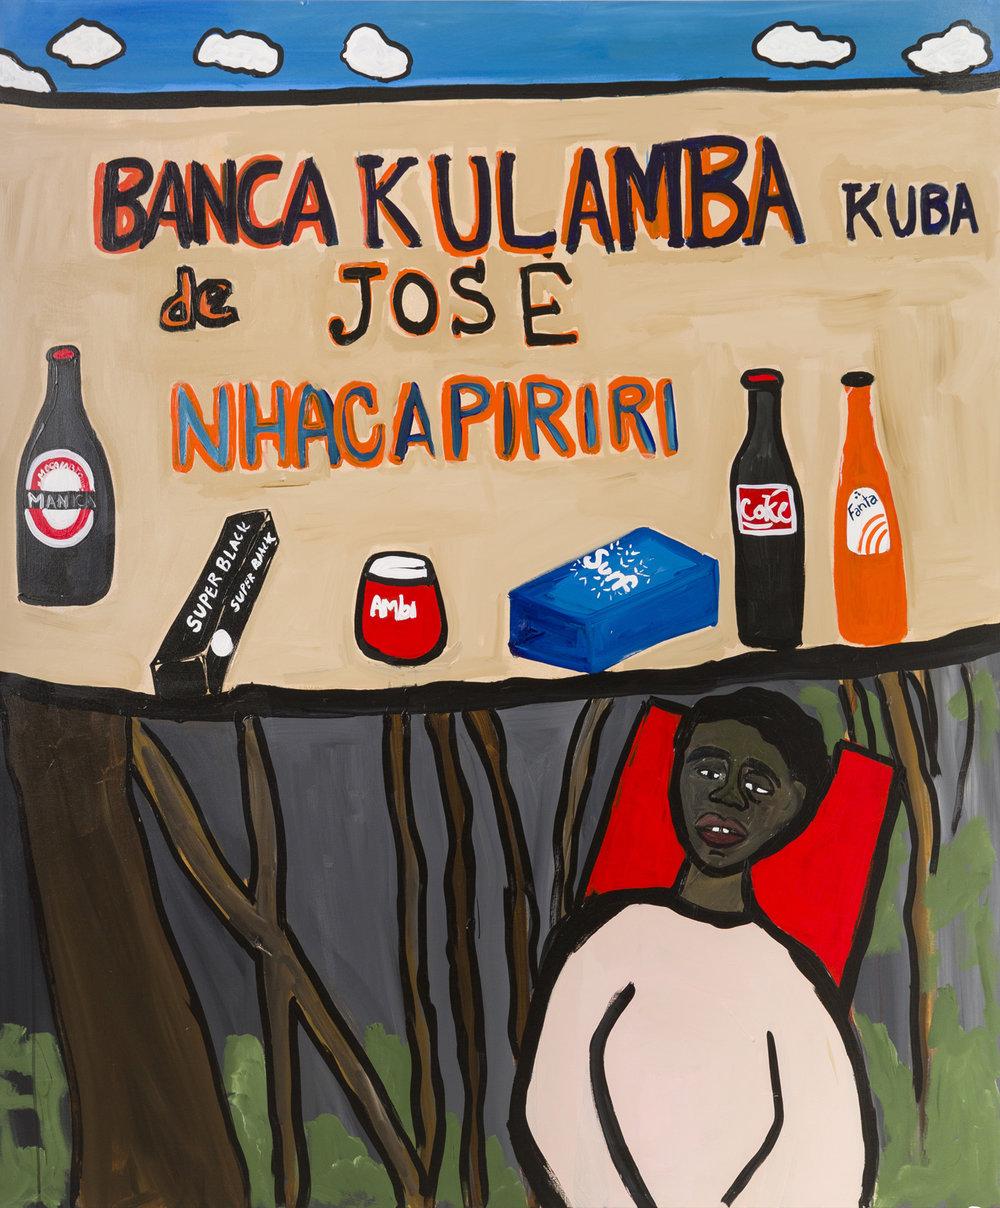 Cassi Namoda   Banca Kulumba  2019 Acrylic on canvas 182.9 x 152.4 cm  Available